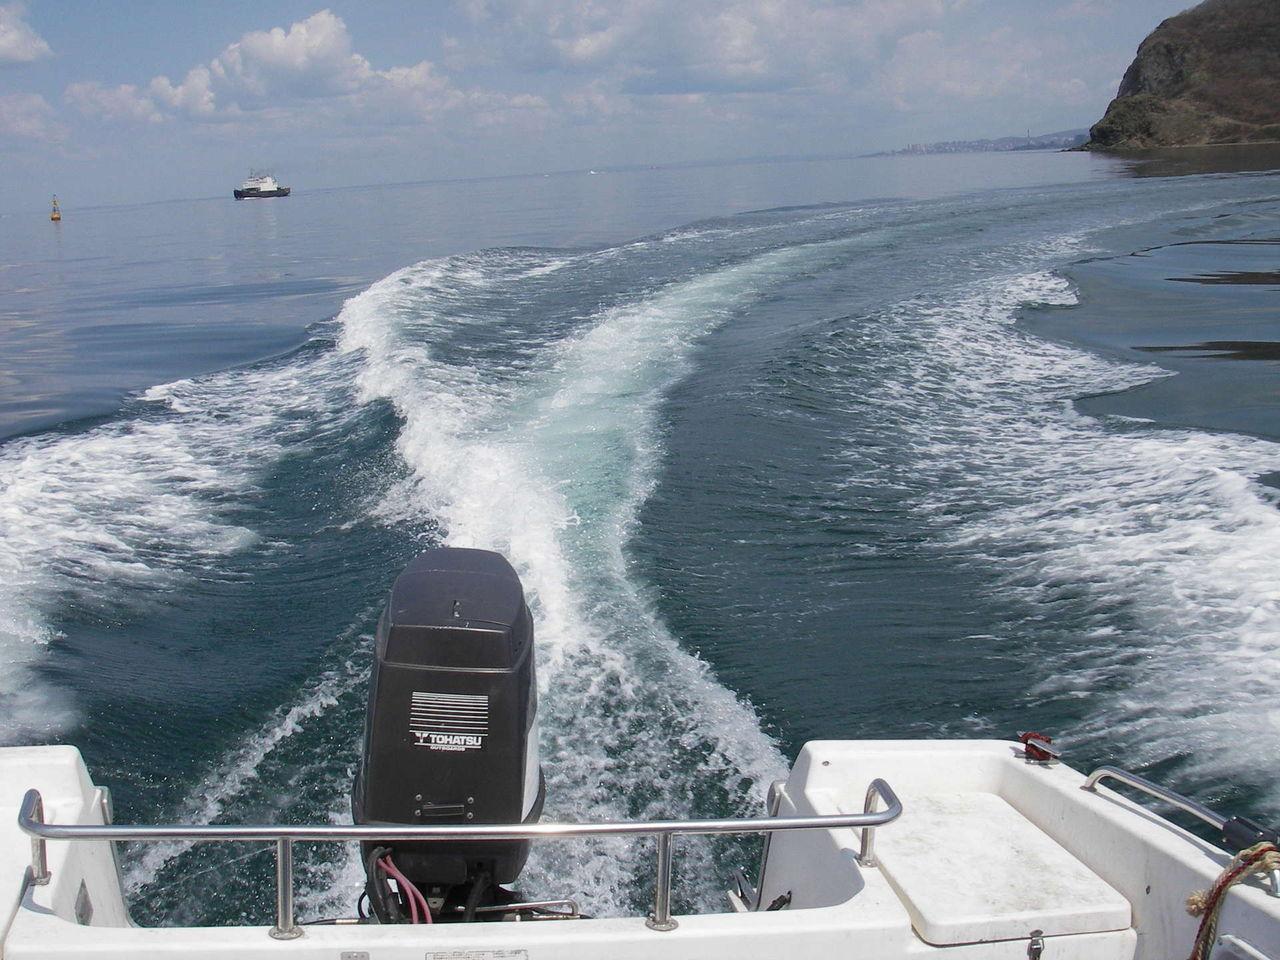 движение по волнам на моторной лодке